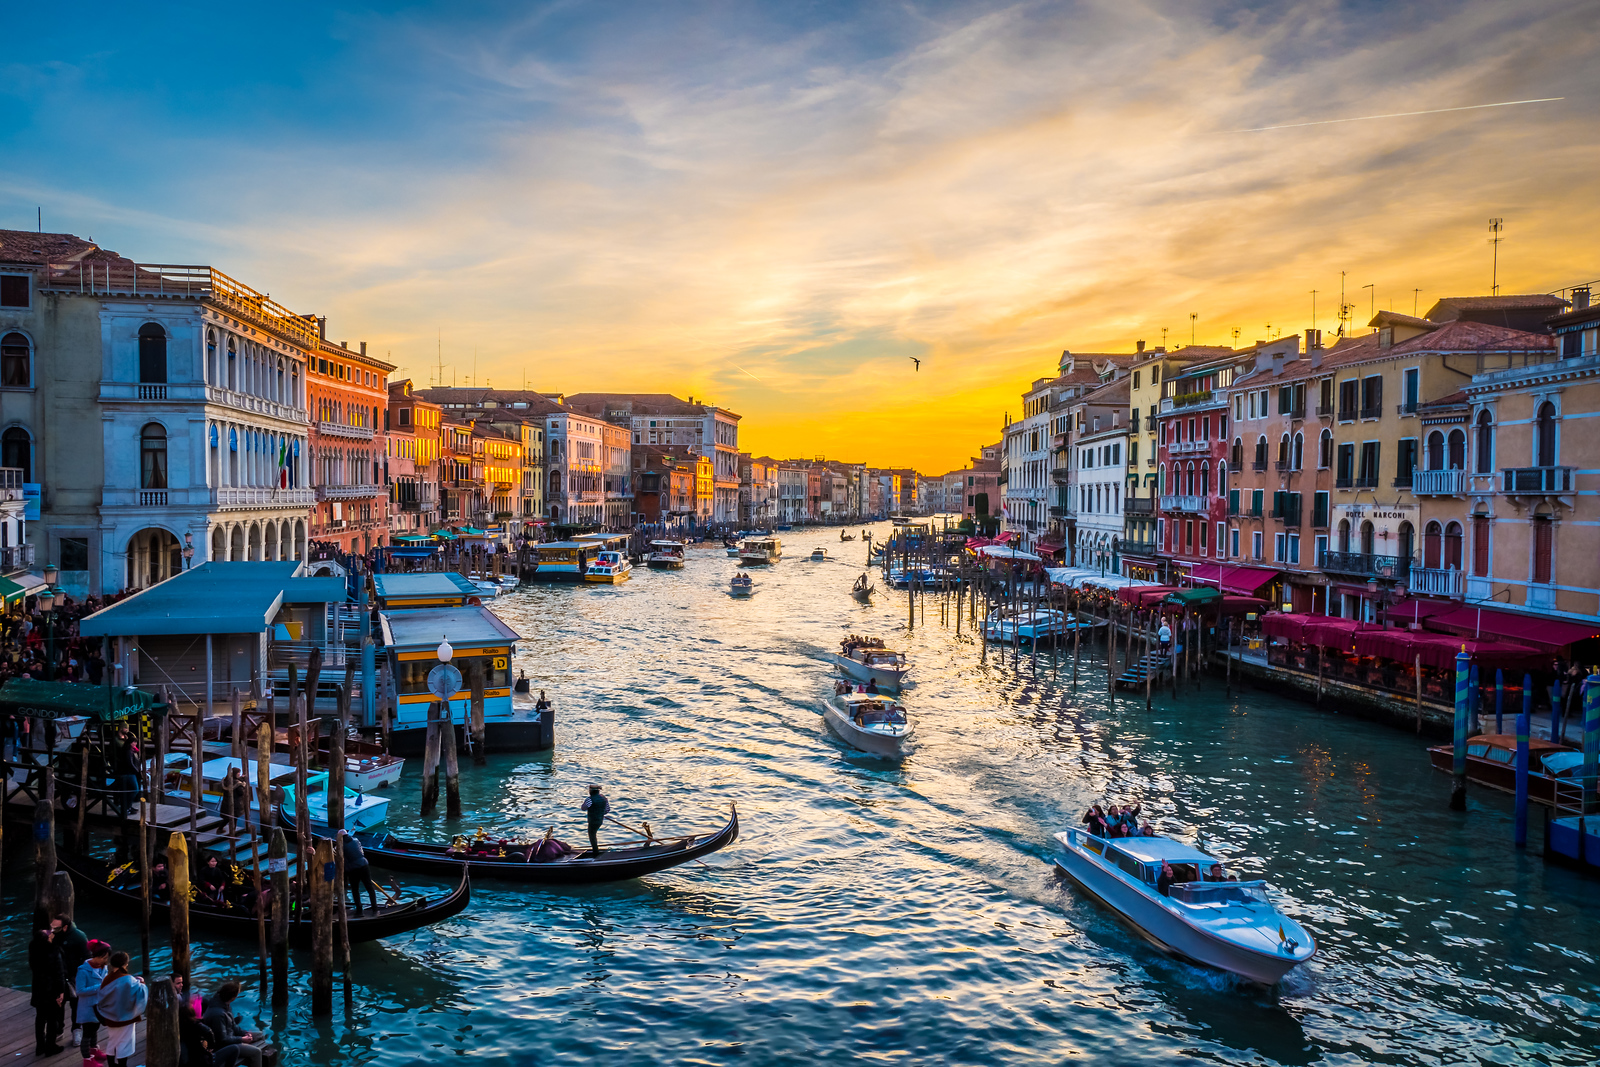 View from Rialto bridge at dusk, Venice